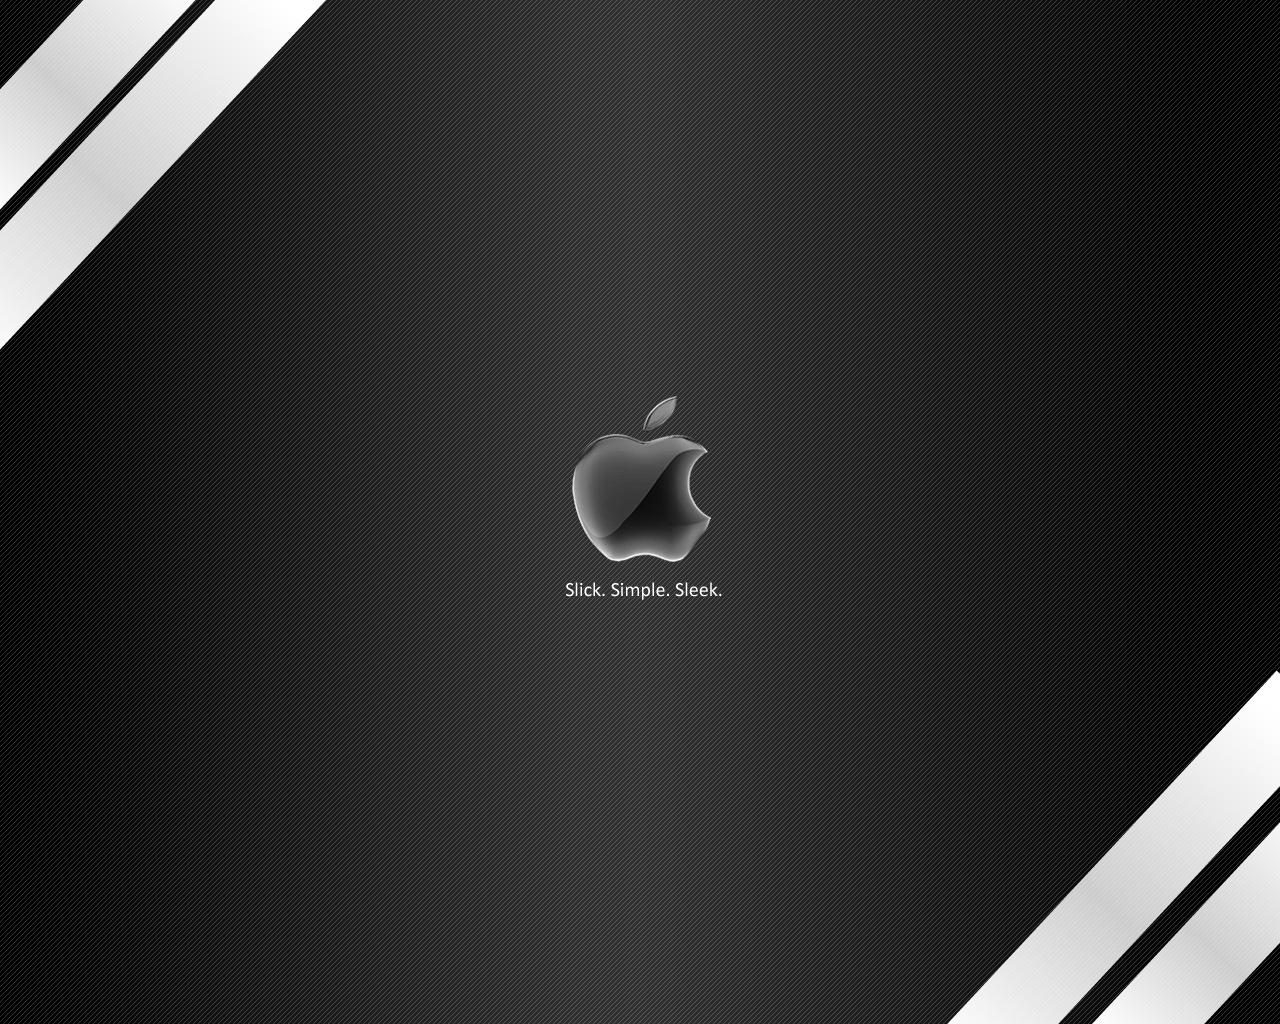 60 Most Beautiful Apple Mac